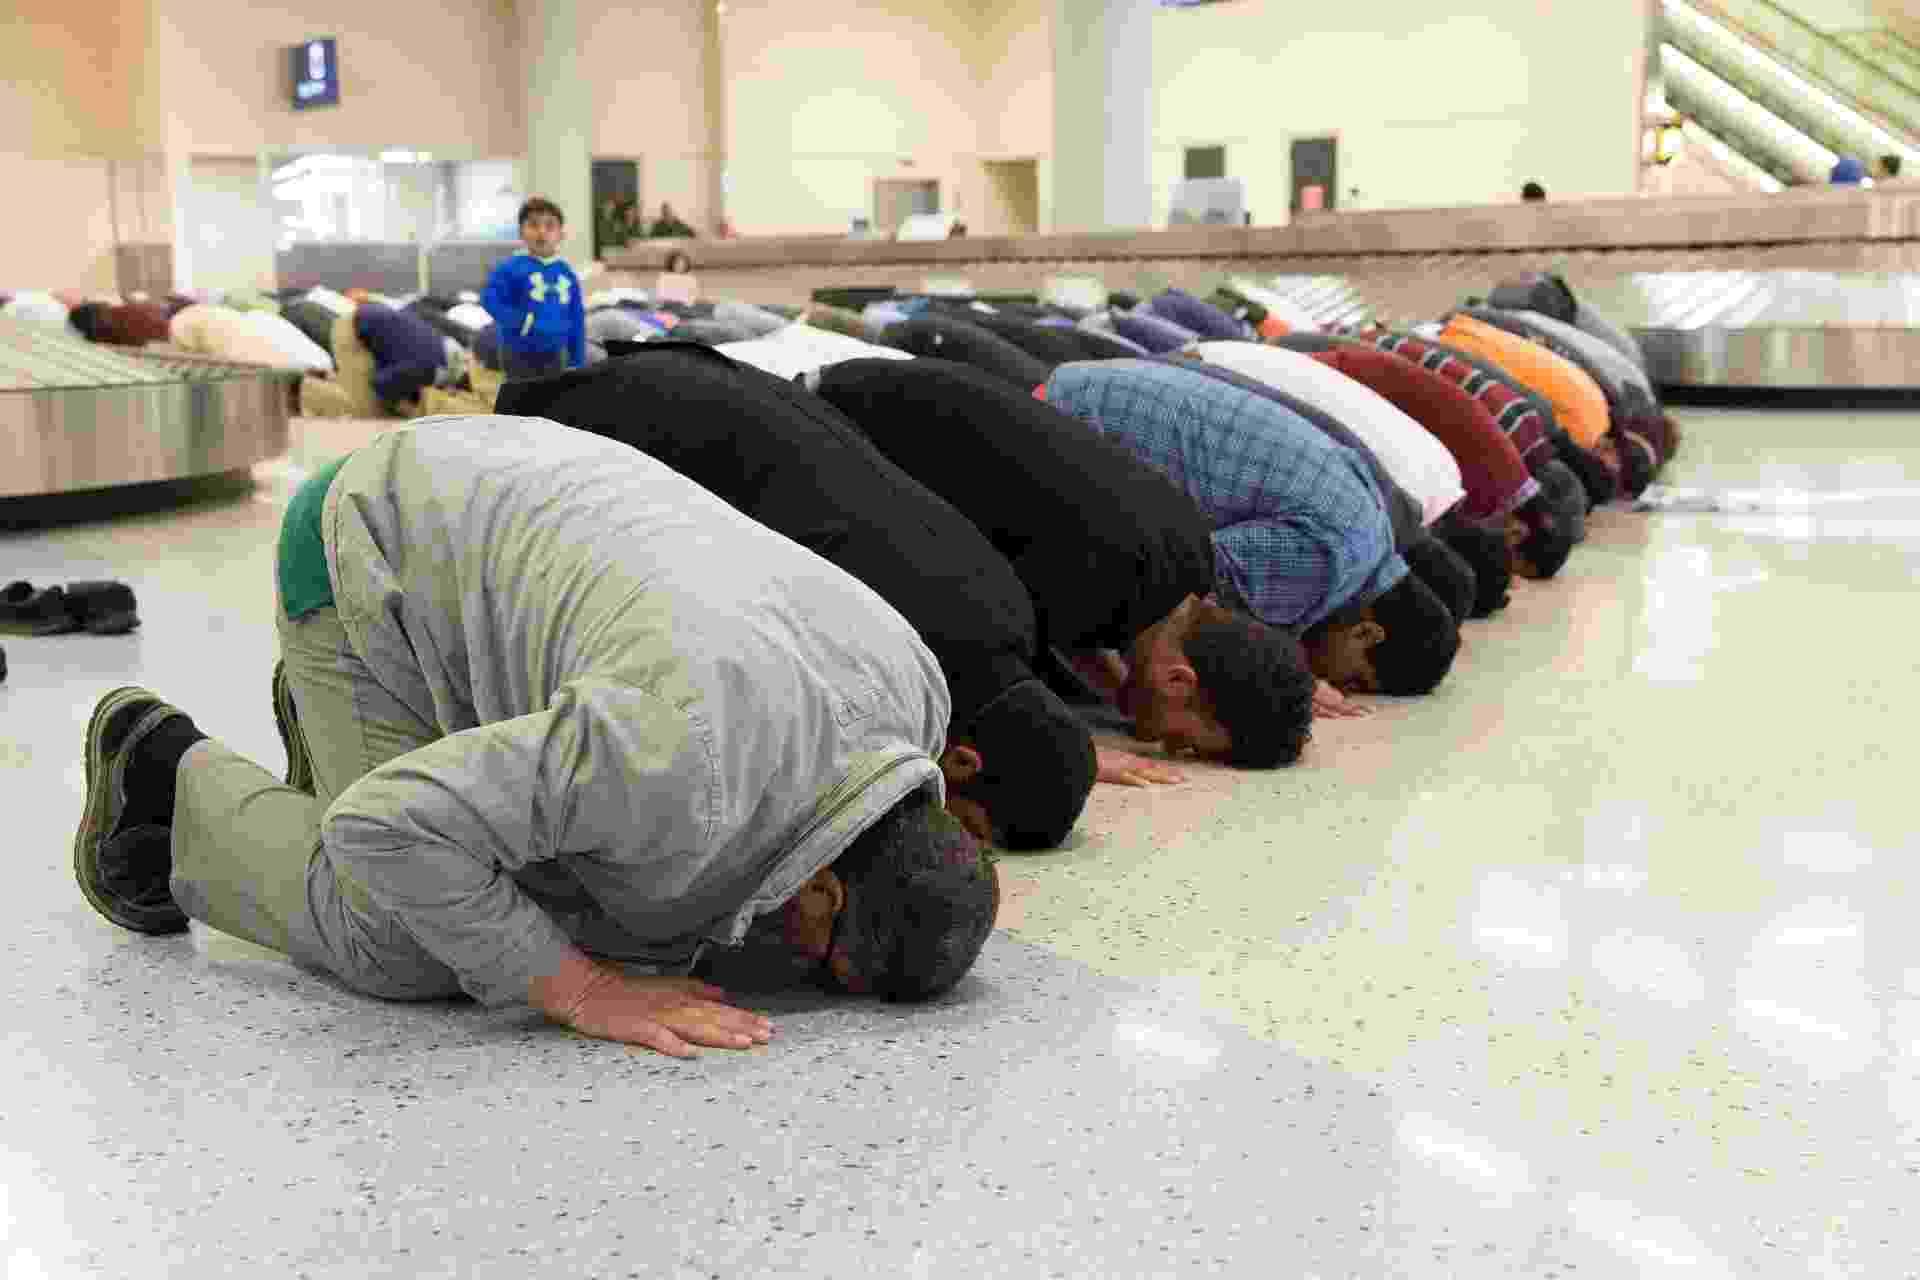 29.jan.2017 - Pessoas rezam na área de retirada de bagagens do aeroporto de Dallas durante ato contra a ordem executiva de Donald Trump que barra a entrada de cidadãos de sete países de maioria muçulmana - Laura Buckman/Reuters